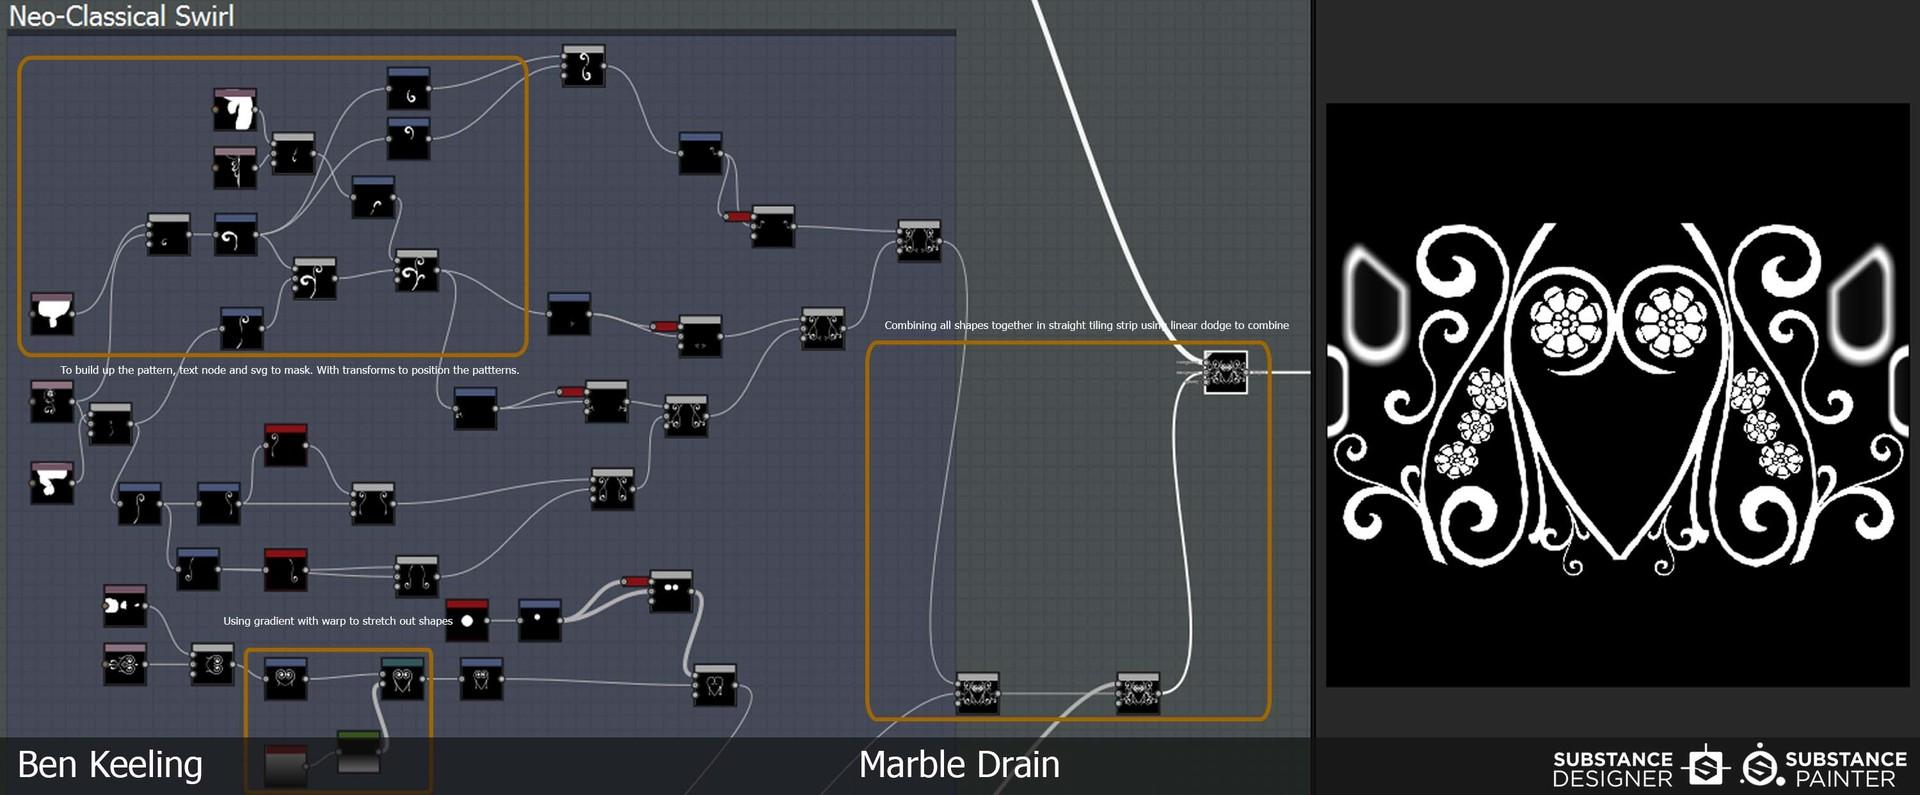 Ben keeling ep marbledrain render graphbreakdown1